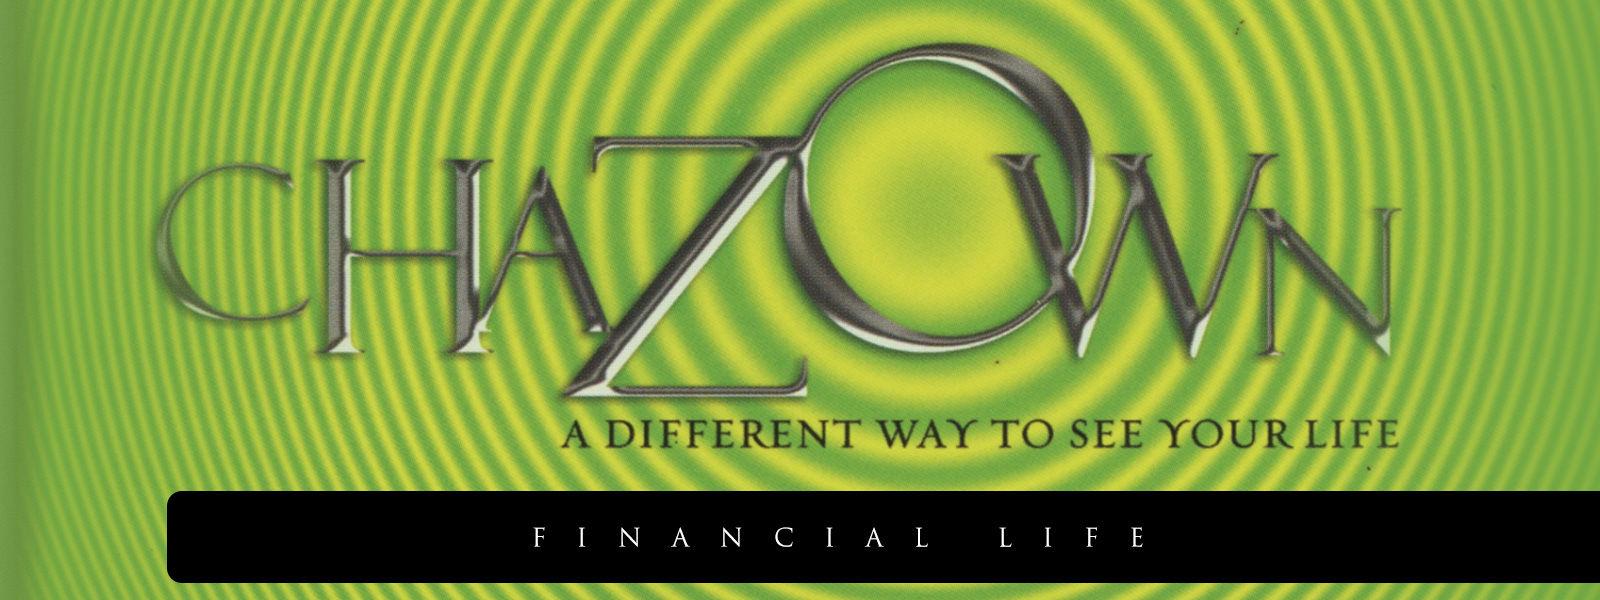 Chazown: Financial Life